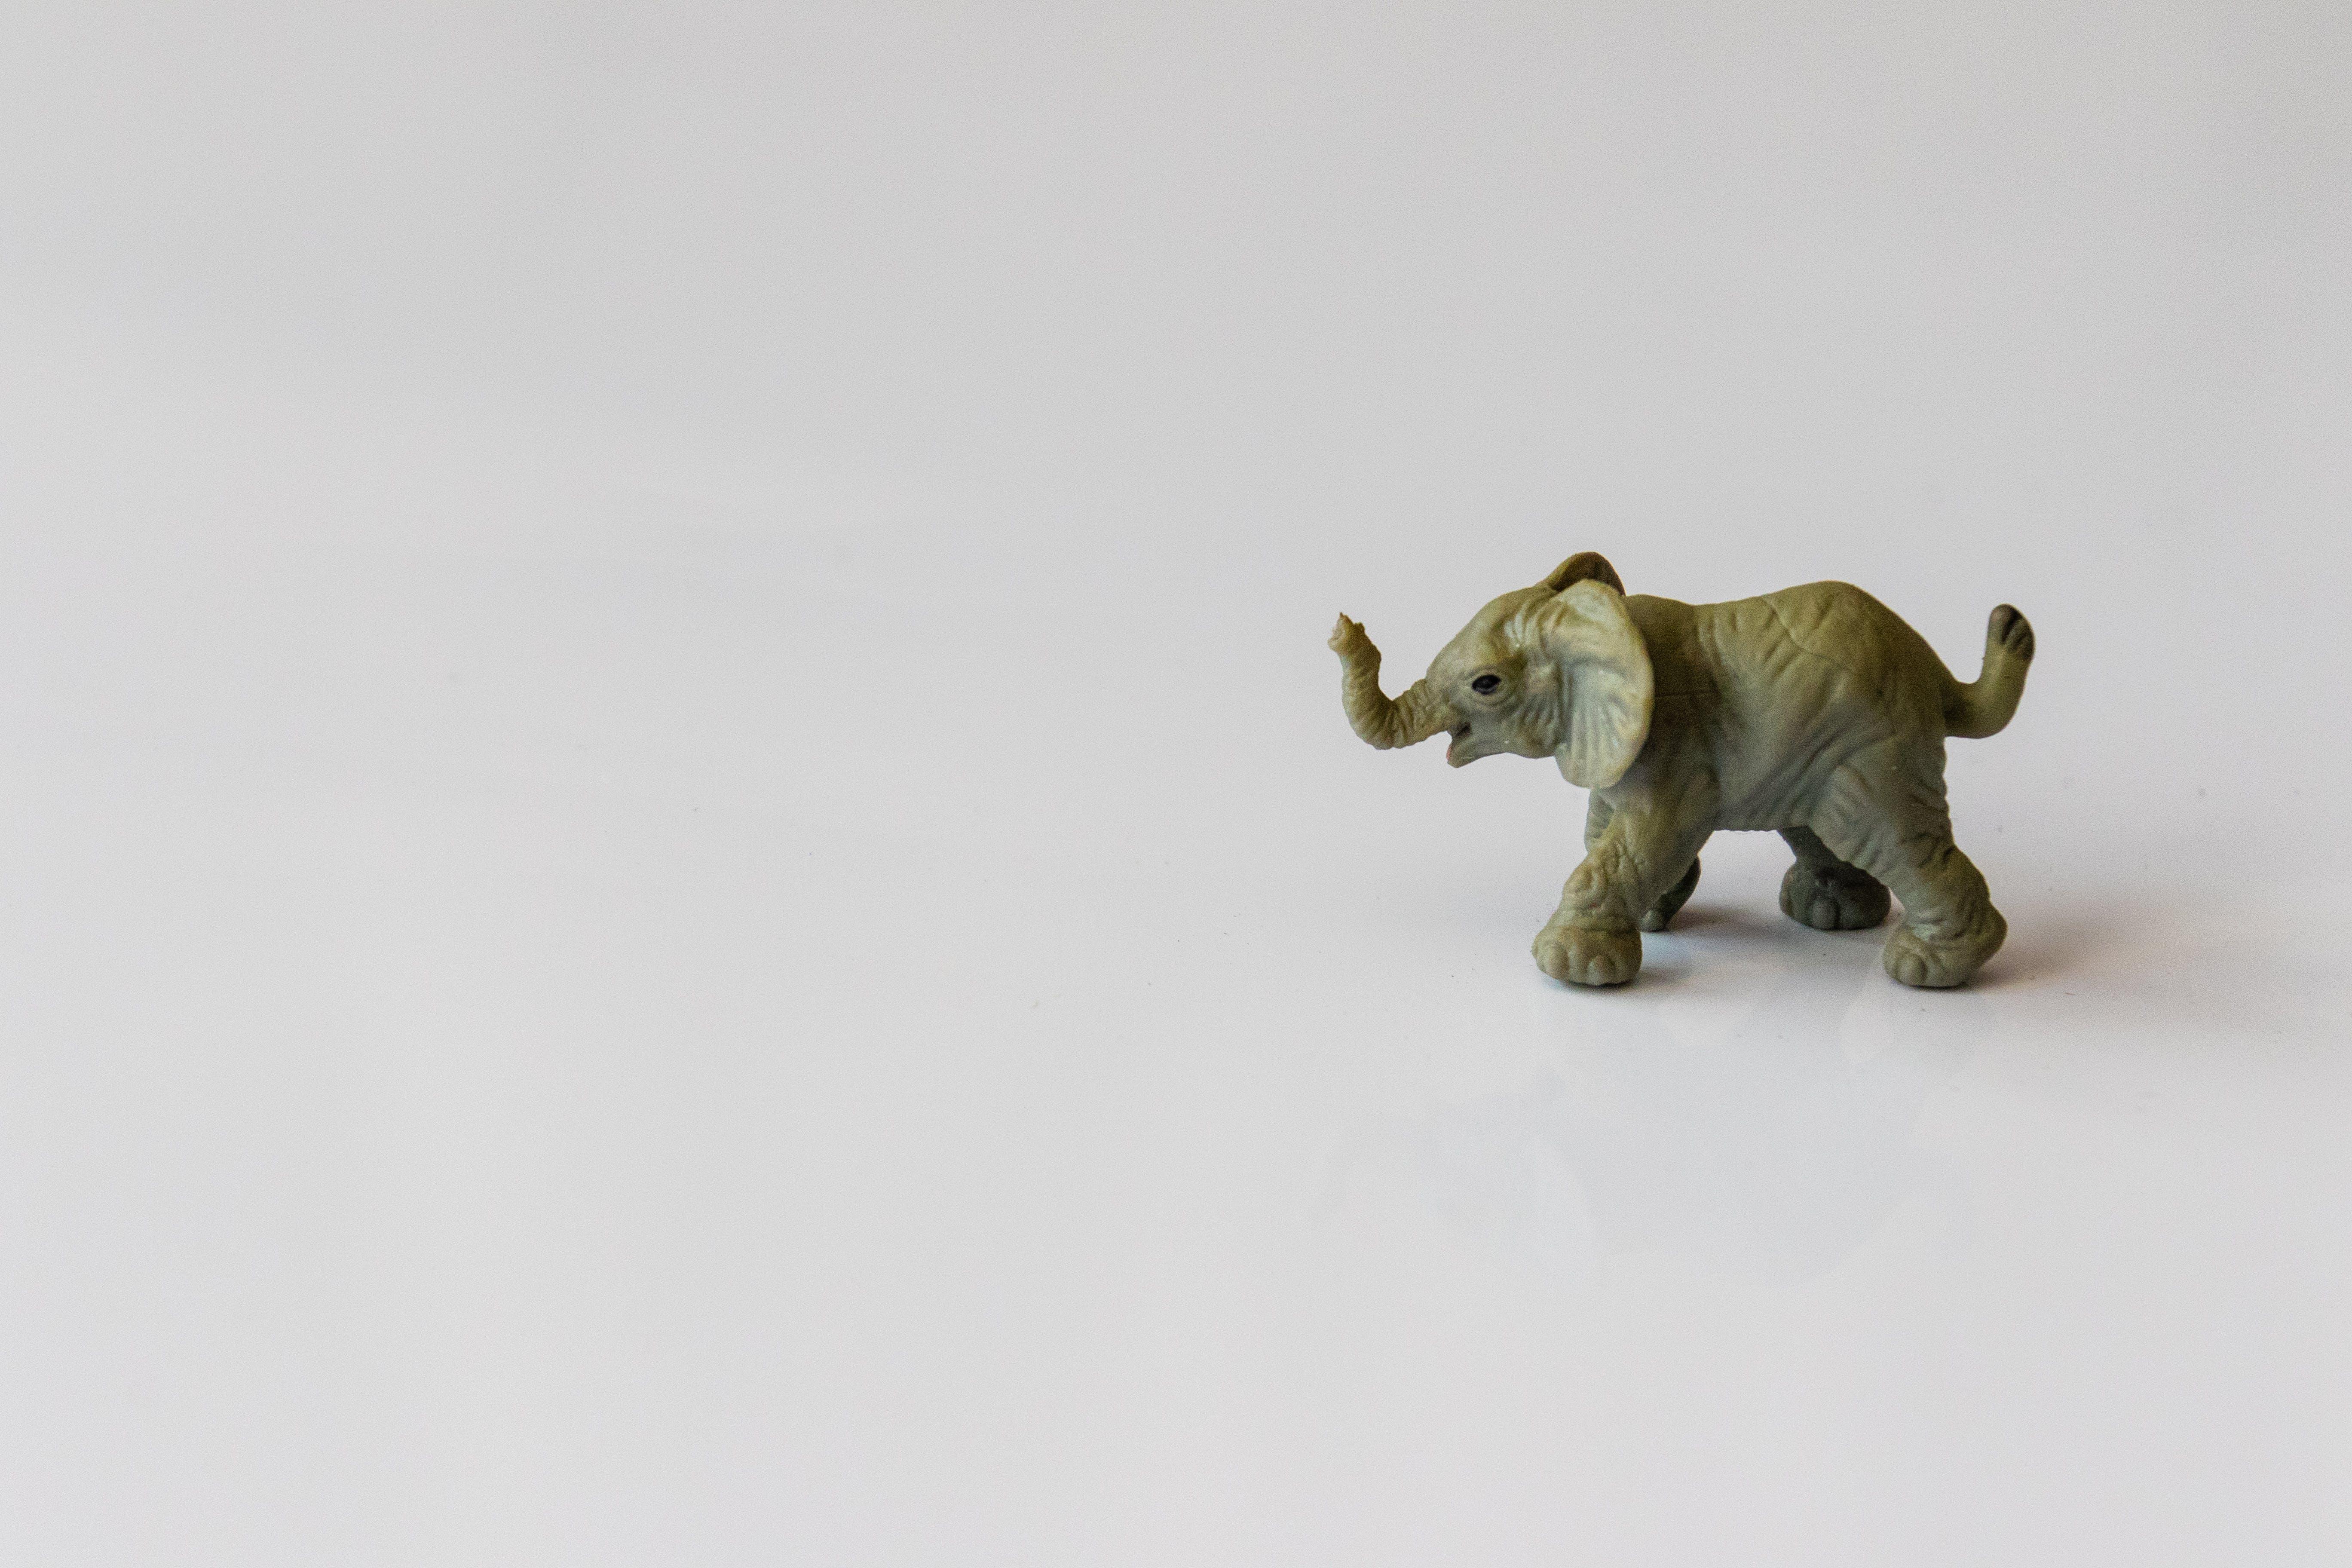 Gray Elephant Figurine